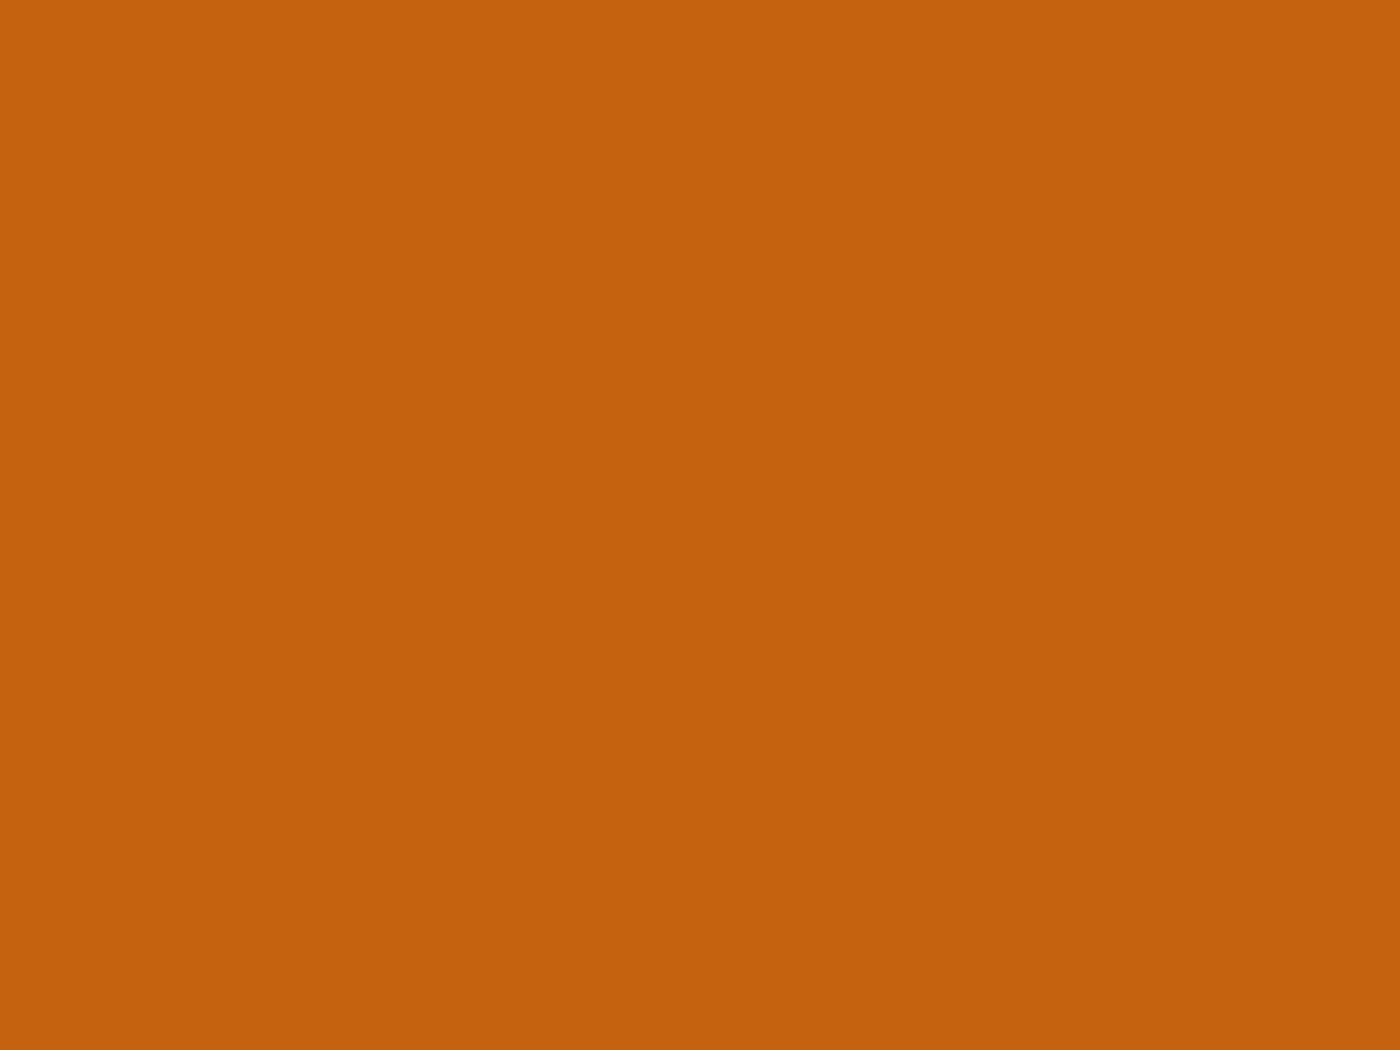 1400x1050 Alloy Orange Solid Color Background